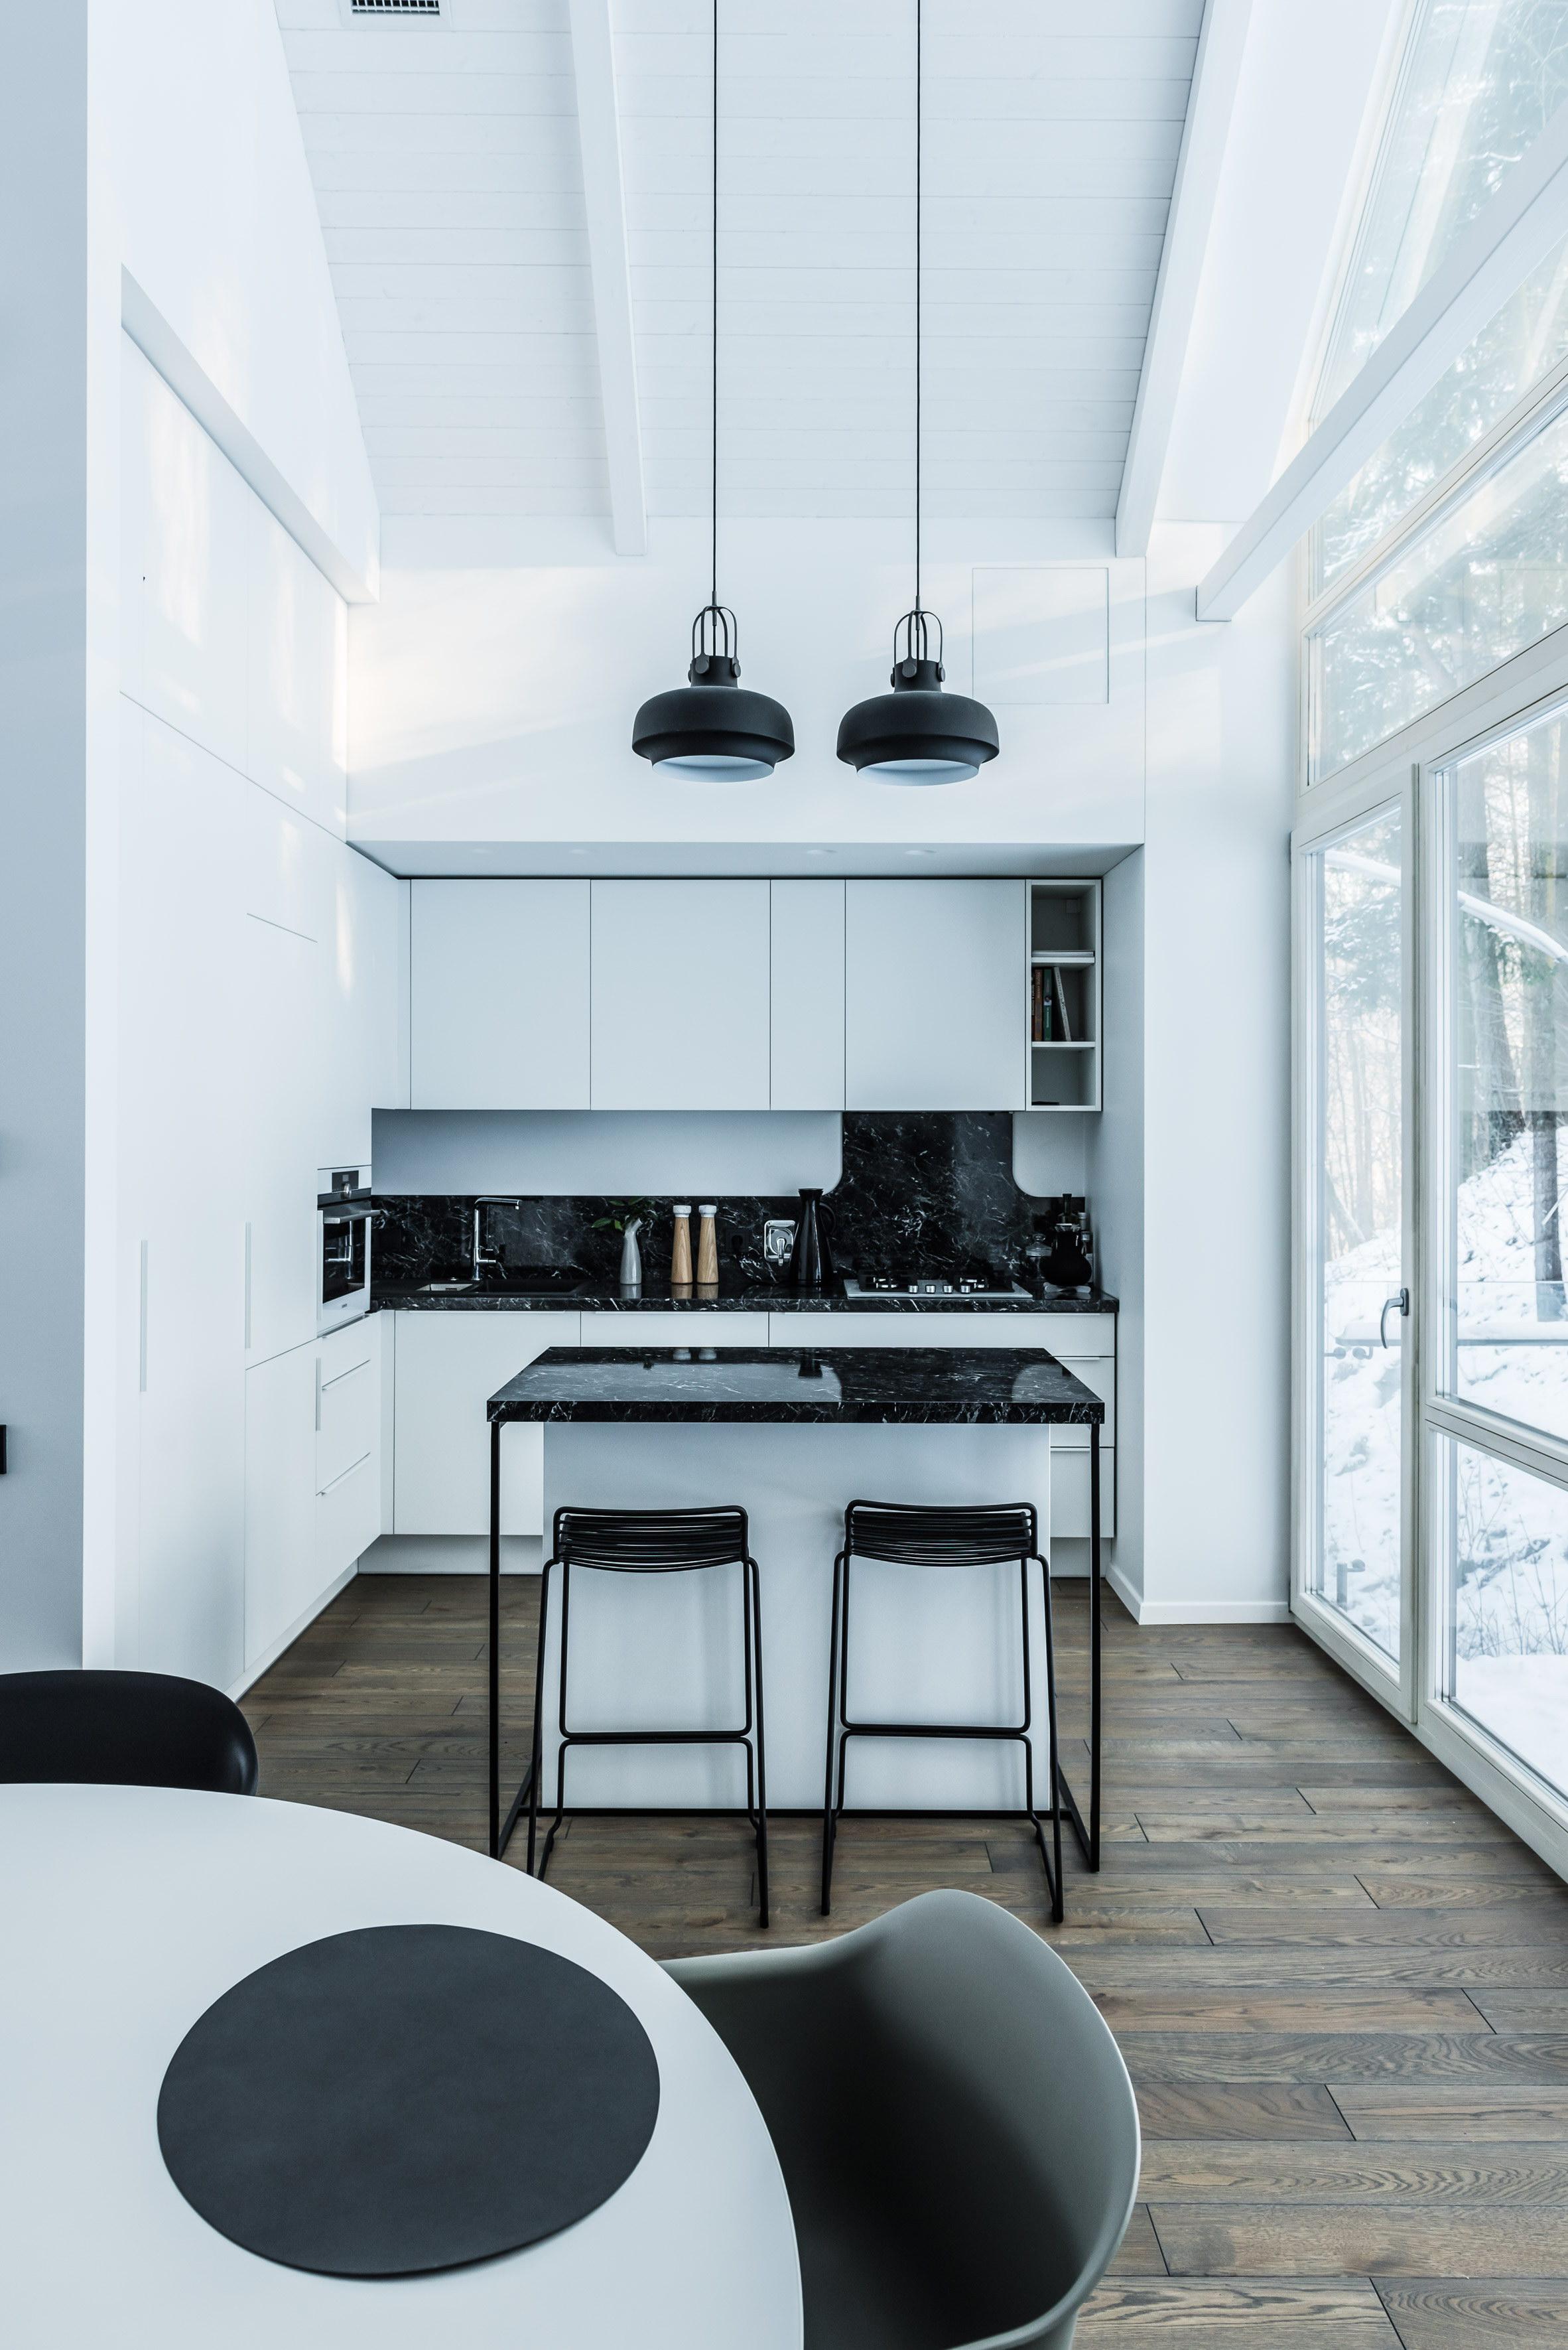 Monochrome Interior of House on Stilts by Dizaino Virtuvė